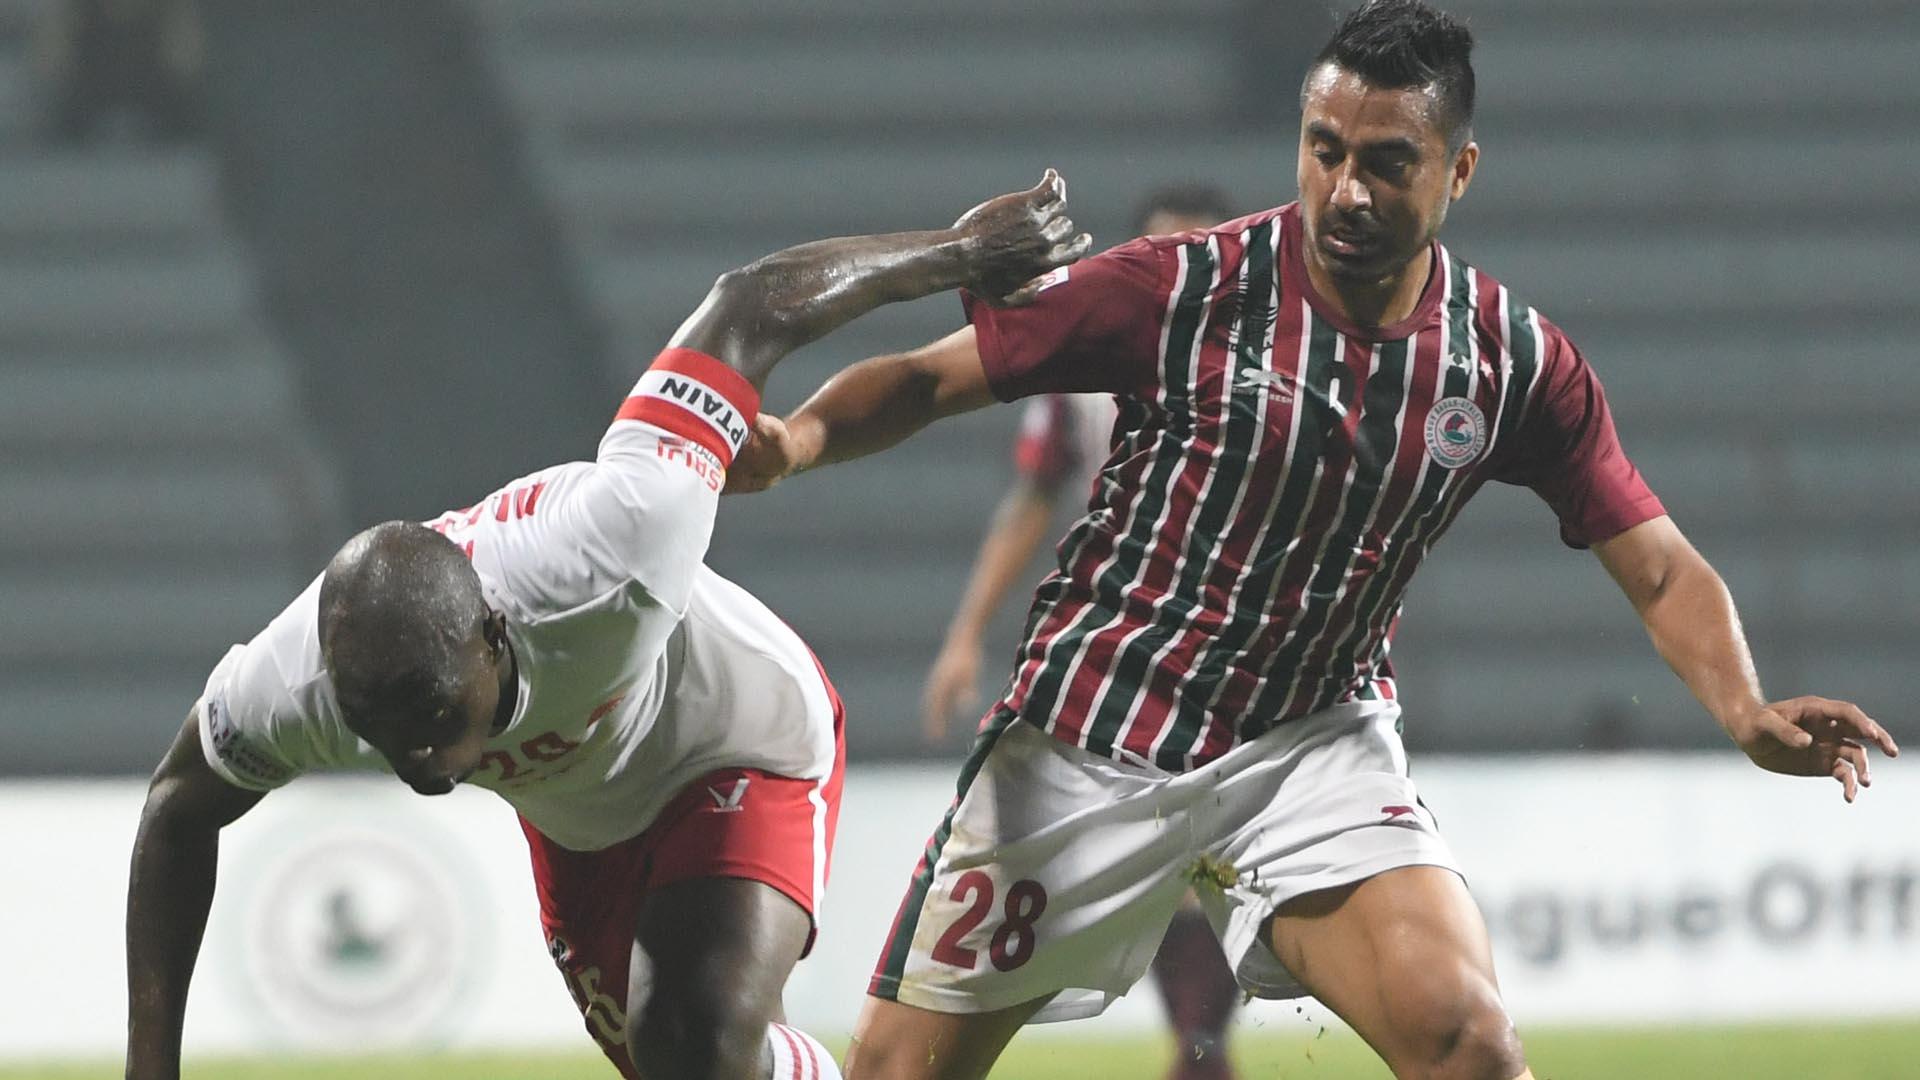 Sehnaj Singh Mohun Bagan Aizawl I-League 2017